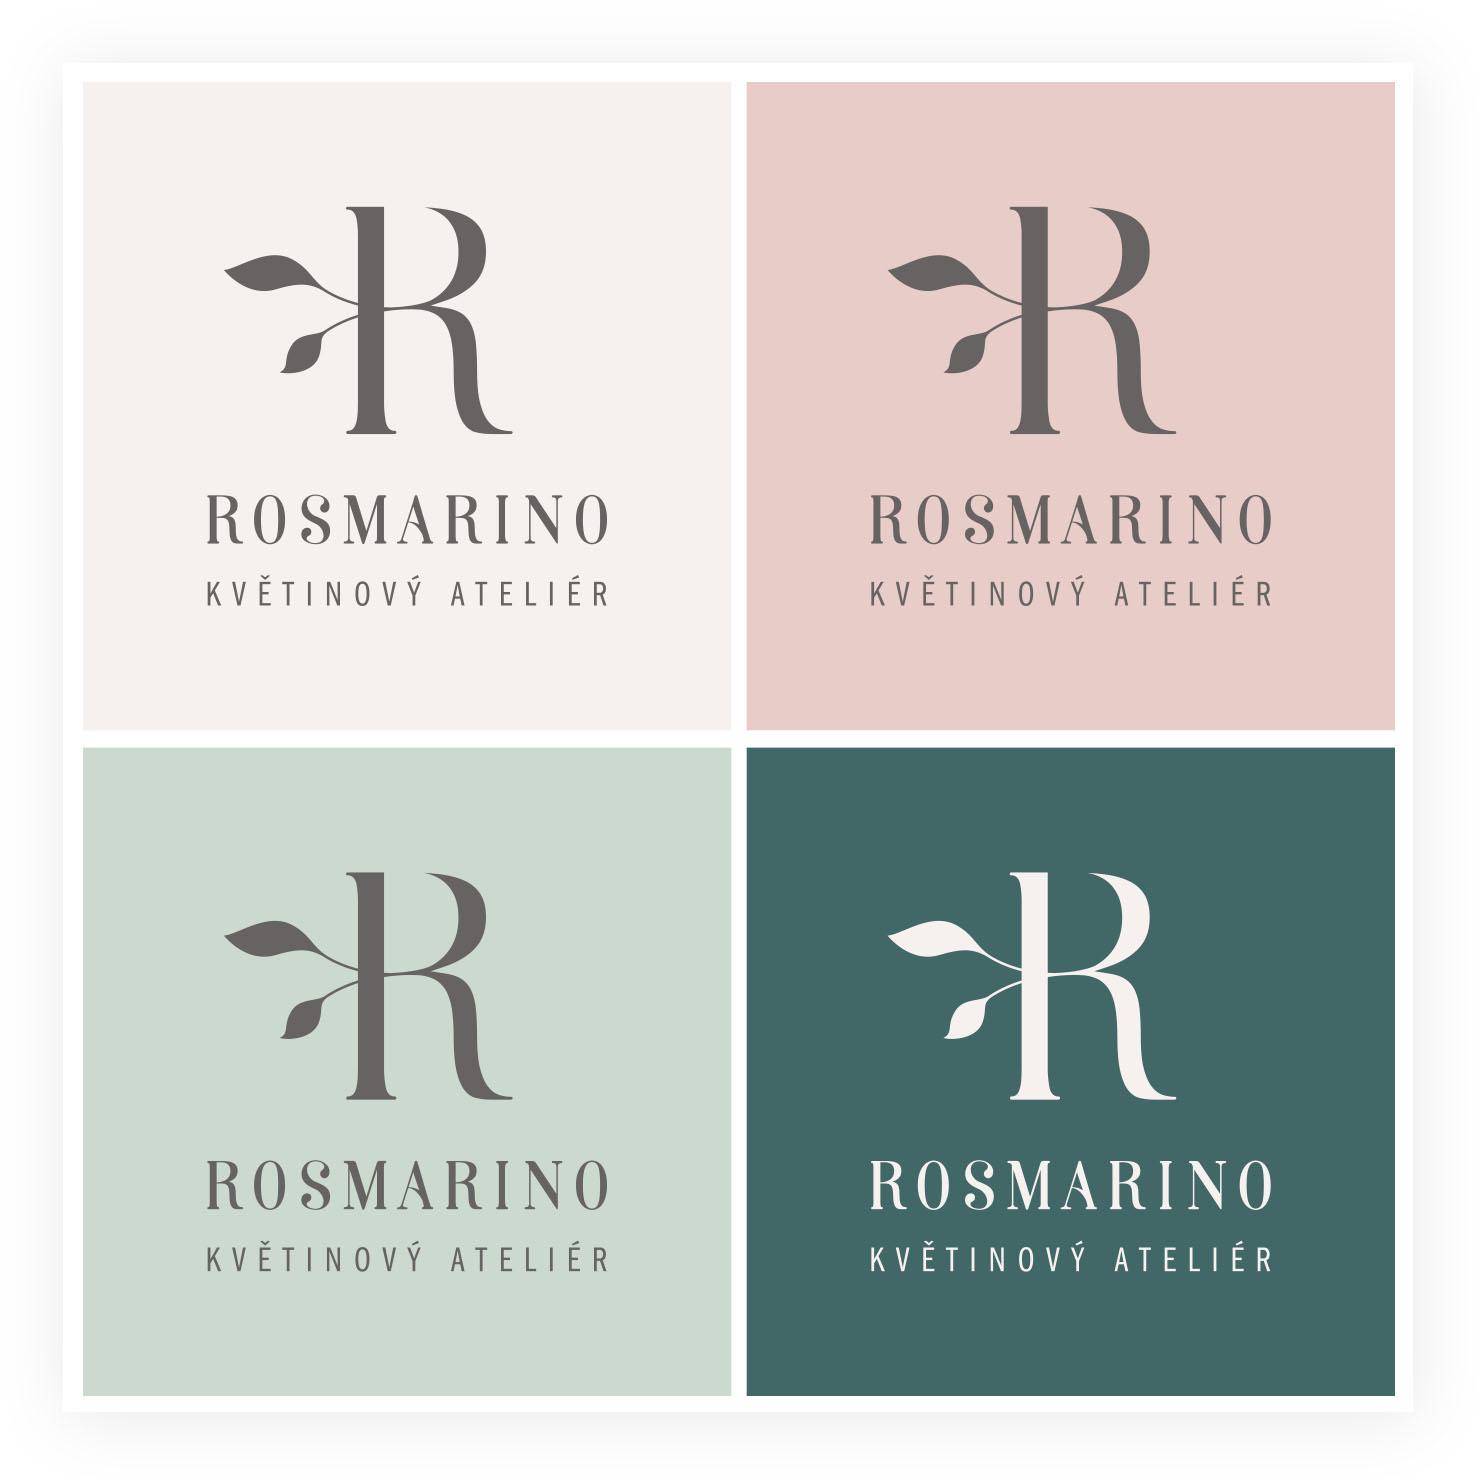 rosmarino_logo2